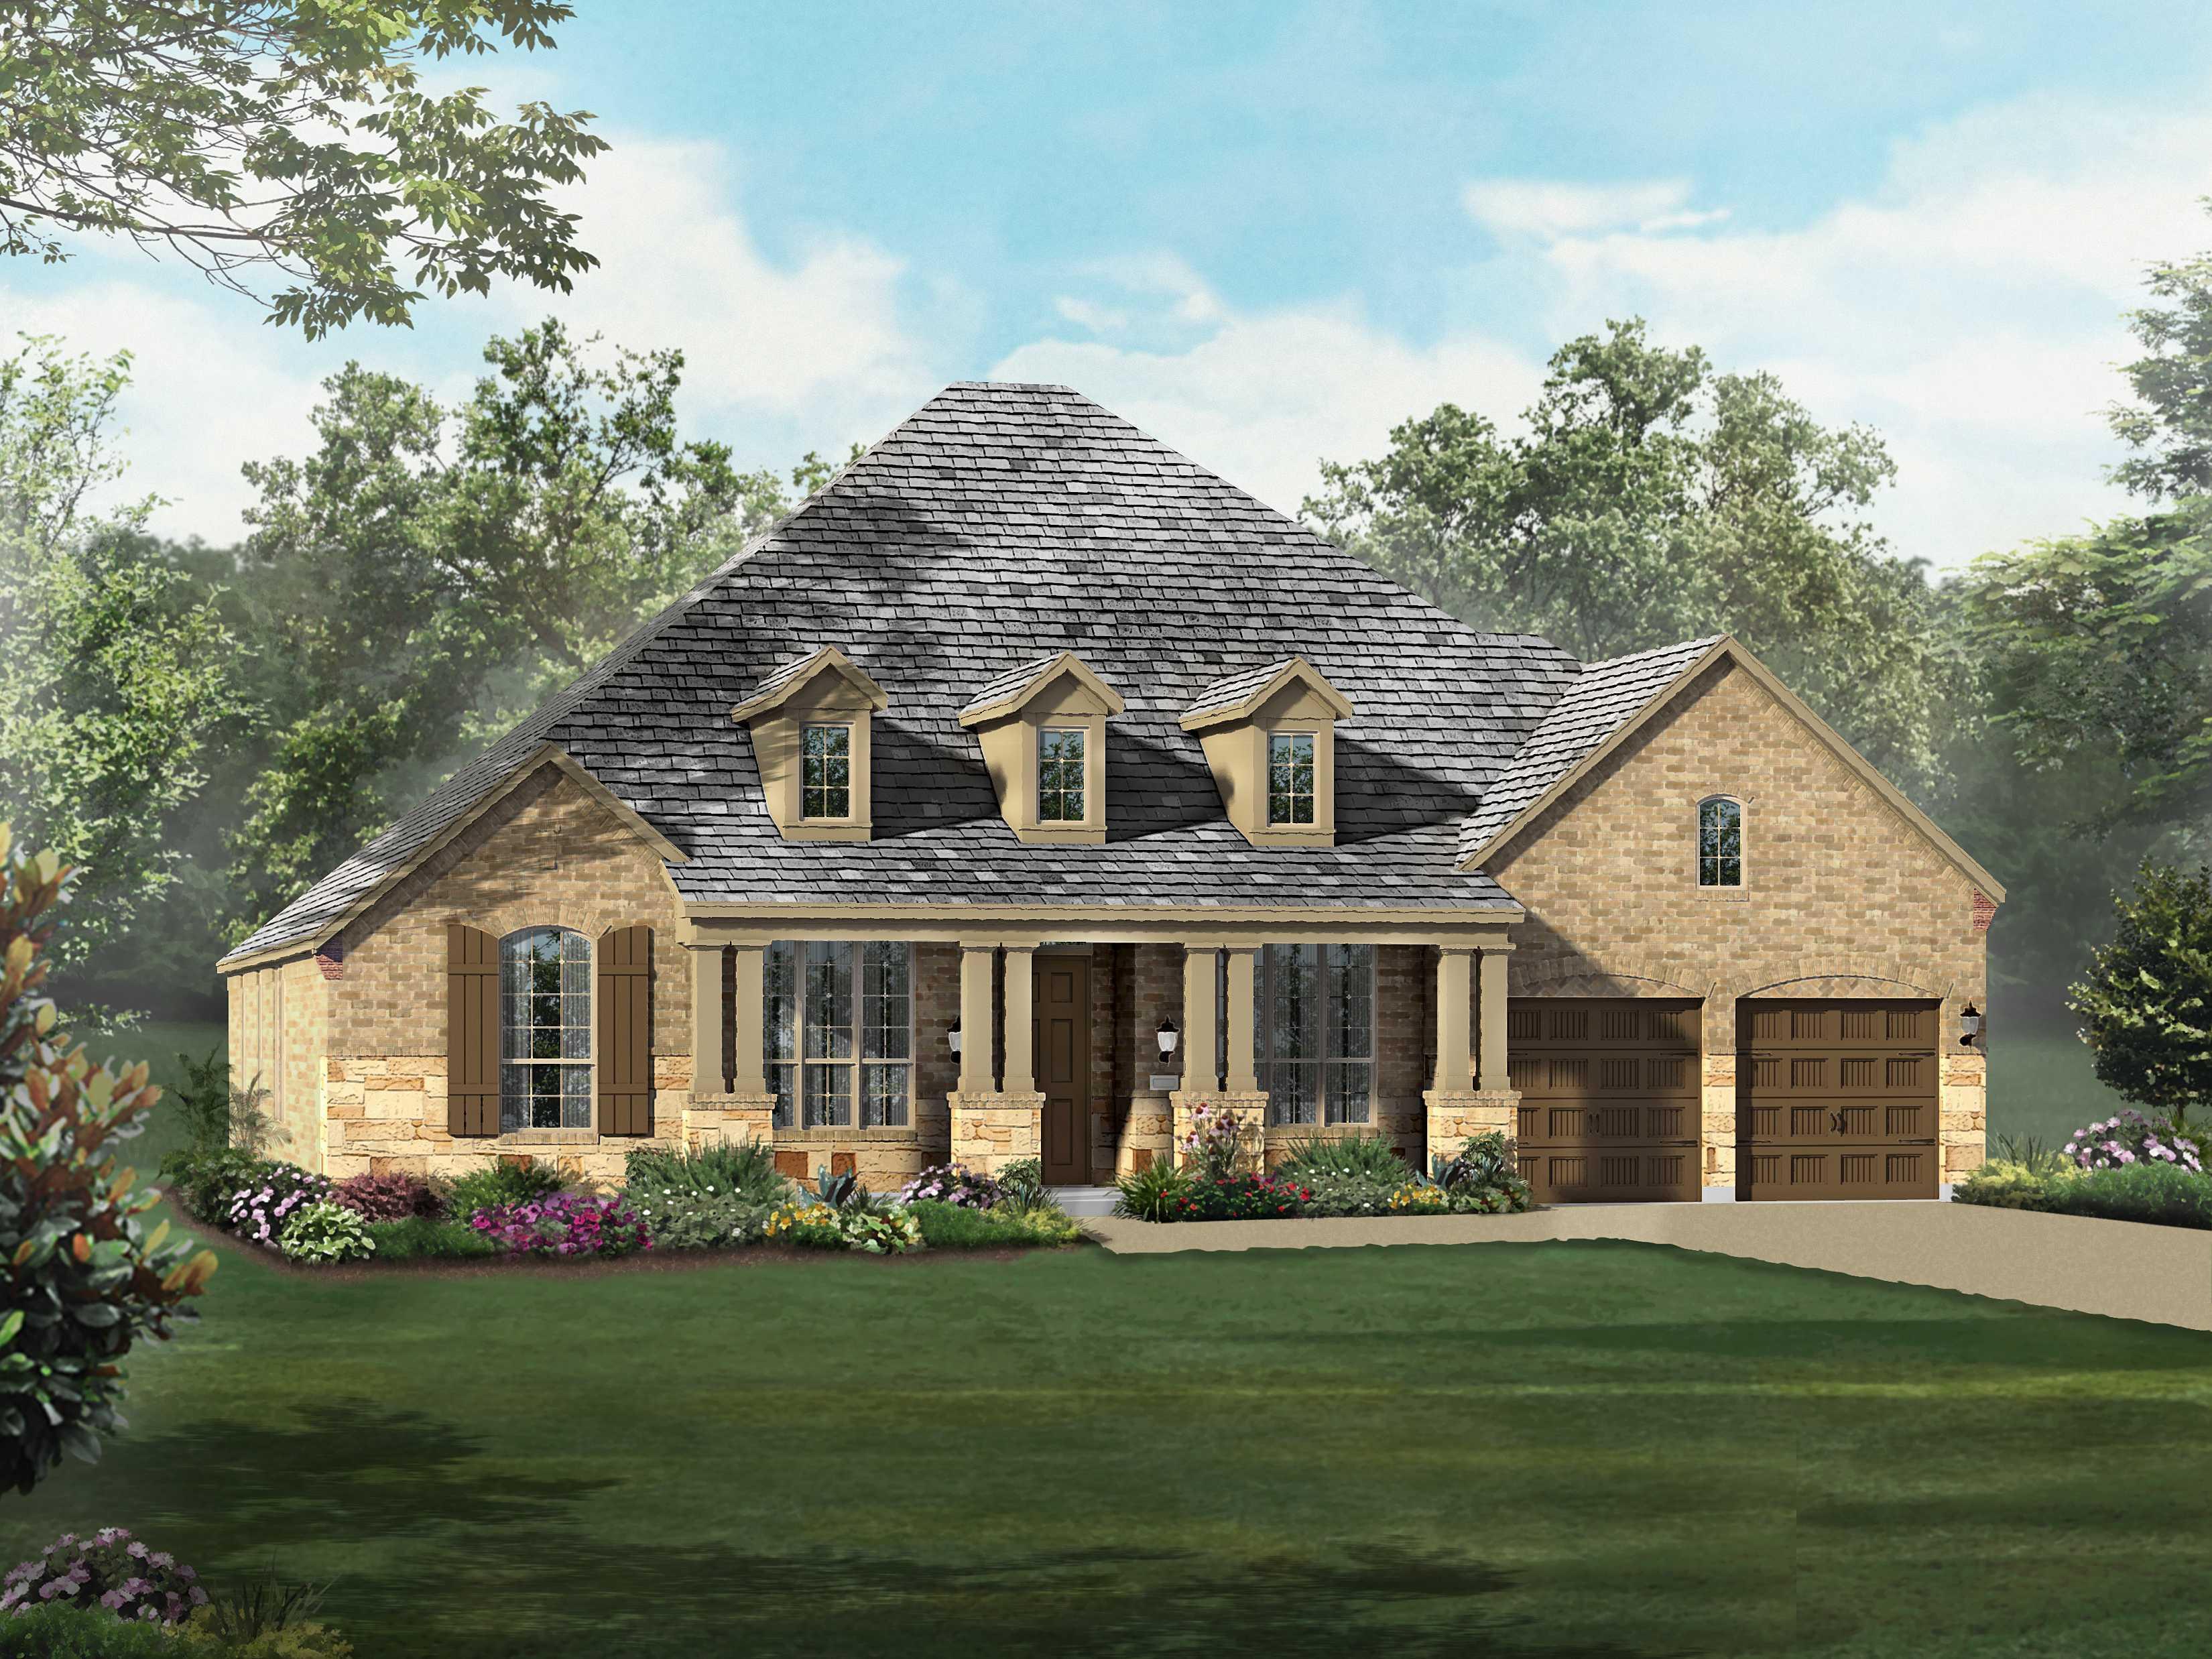 Single Family for Sale at Estates At Fronterra In Westpointe - Plan 262 2102 Buckner Pass San Antonio, Texas 78253 United States